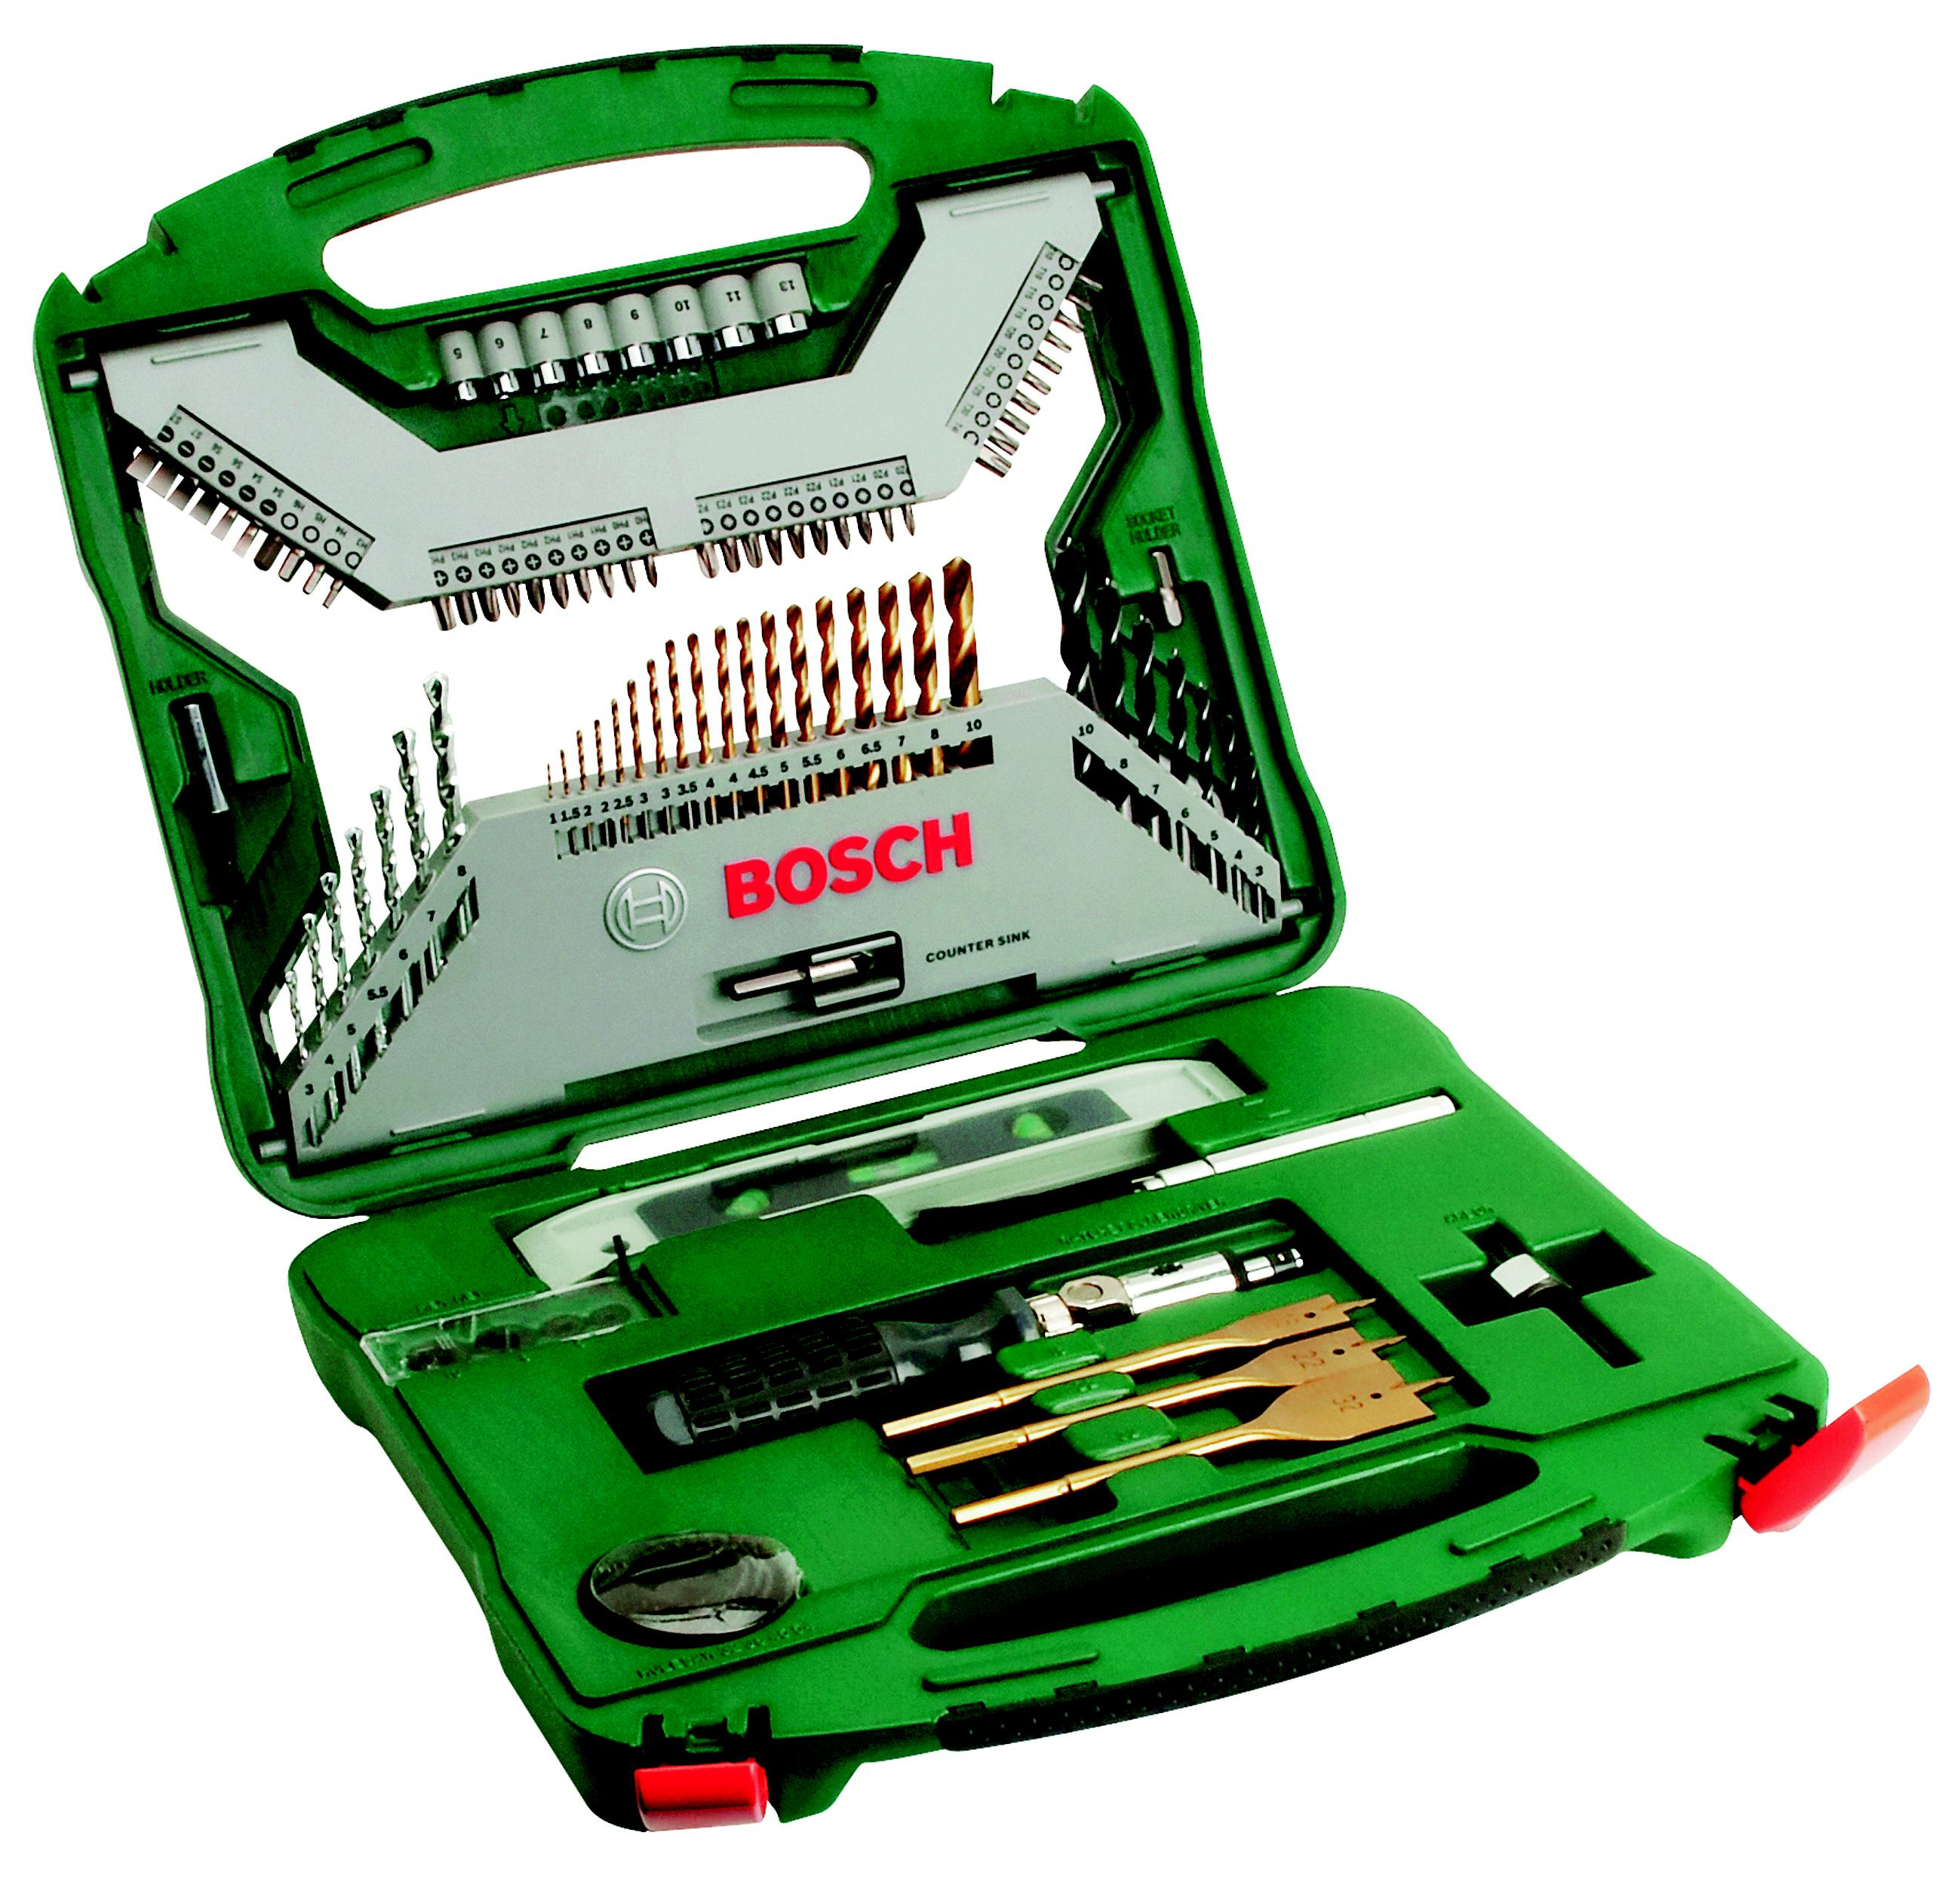 Набор бит и сверл Bosch X-line 100 titanium (2.607.019.330) набор сверл и бит bosch v line 68 2 607 017 191